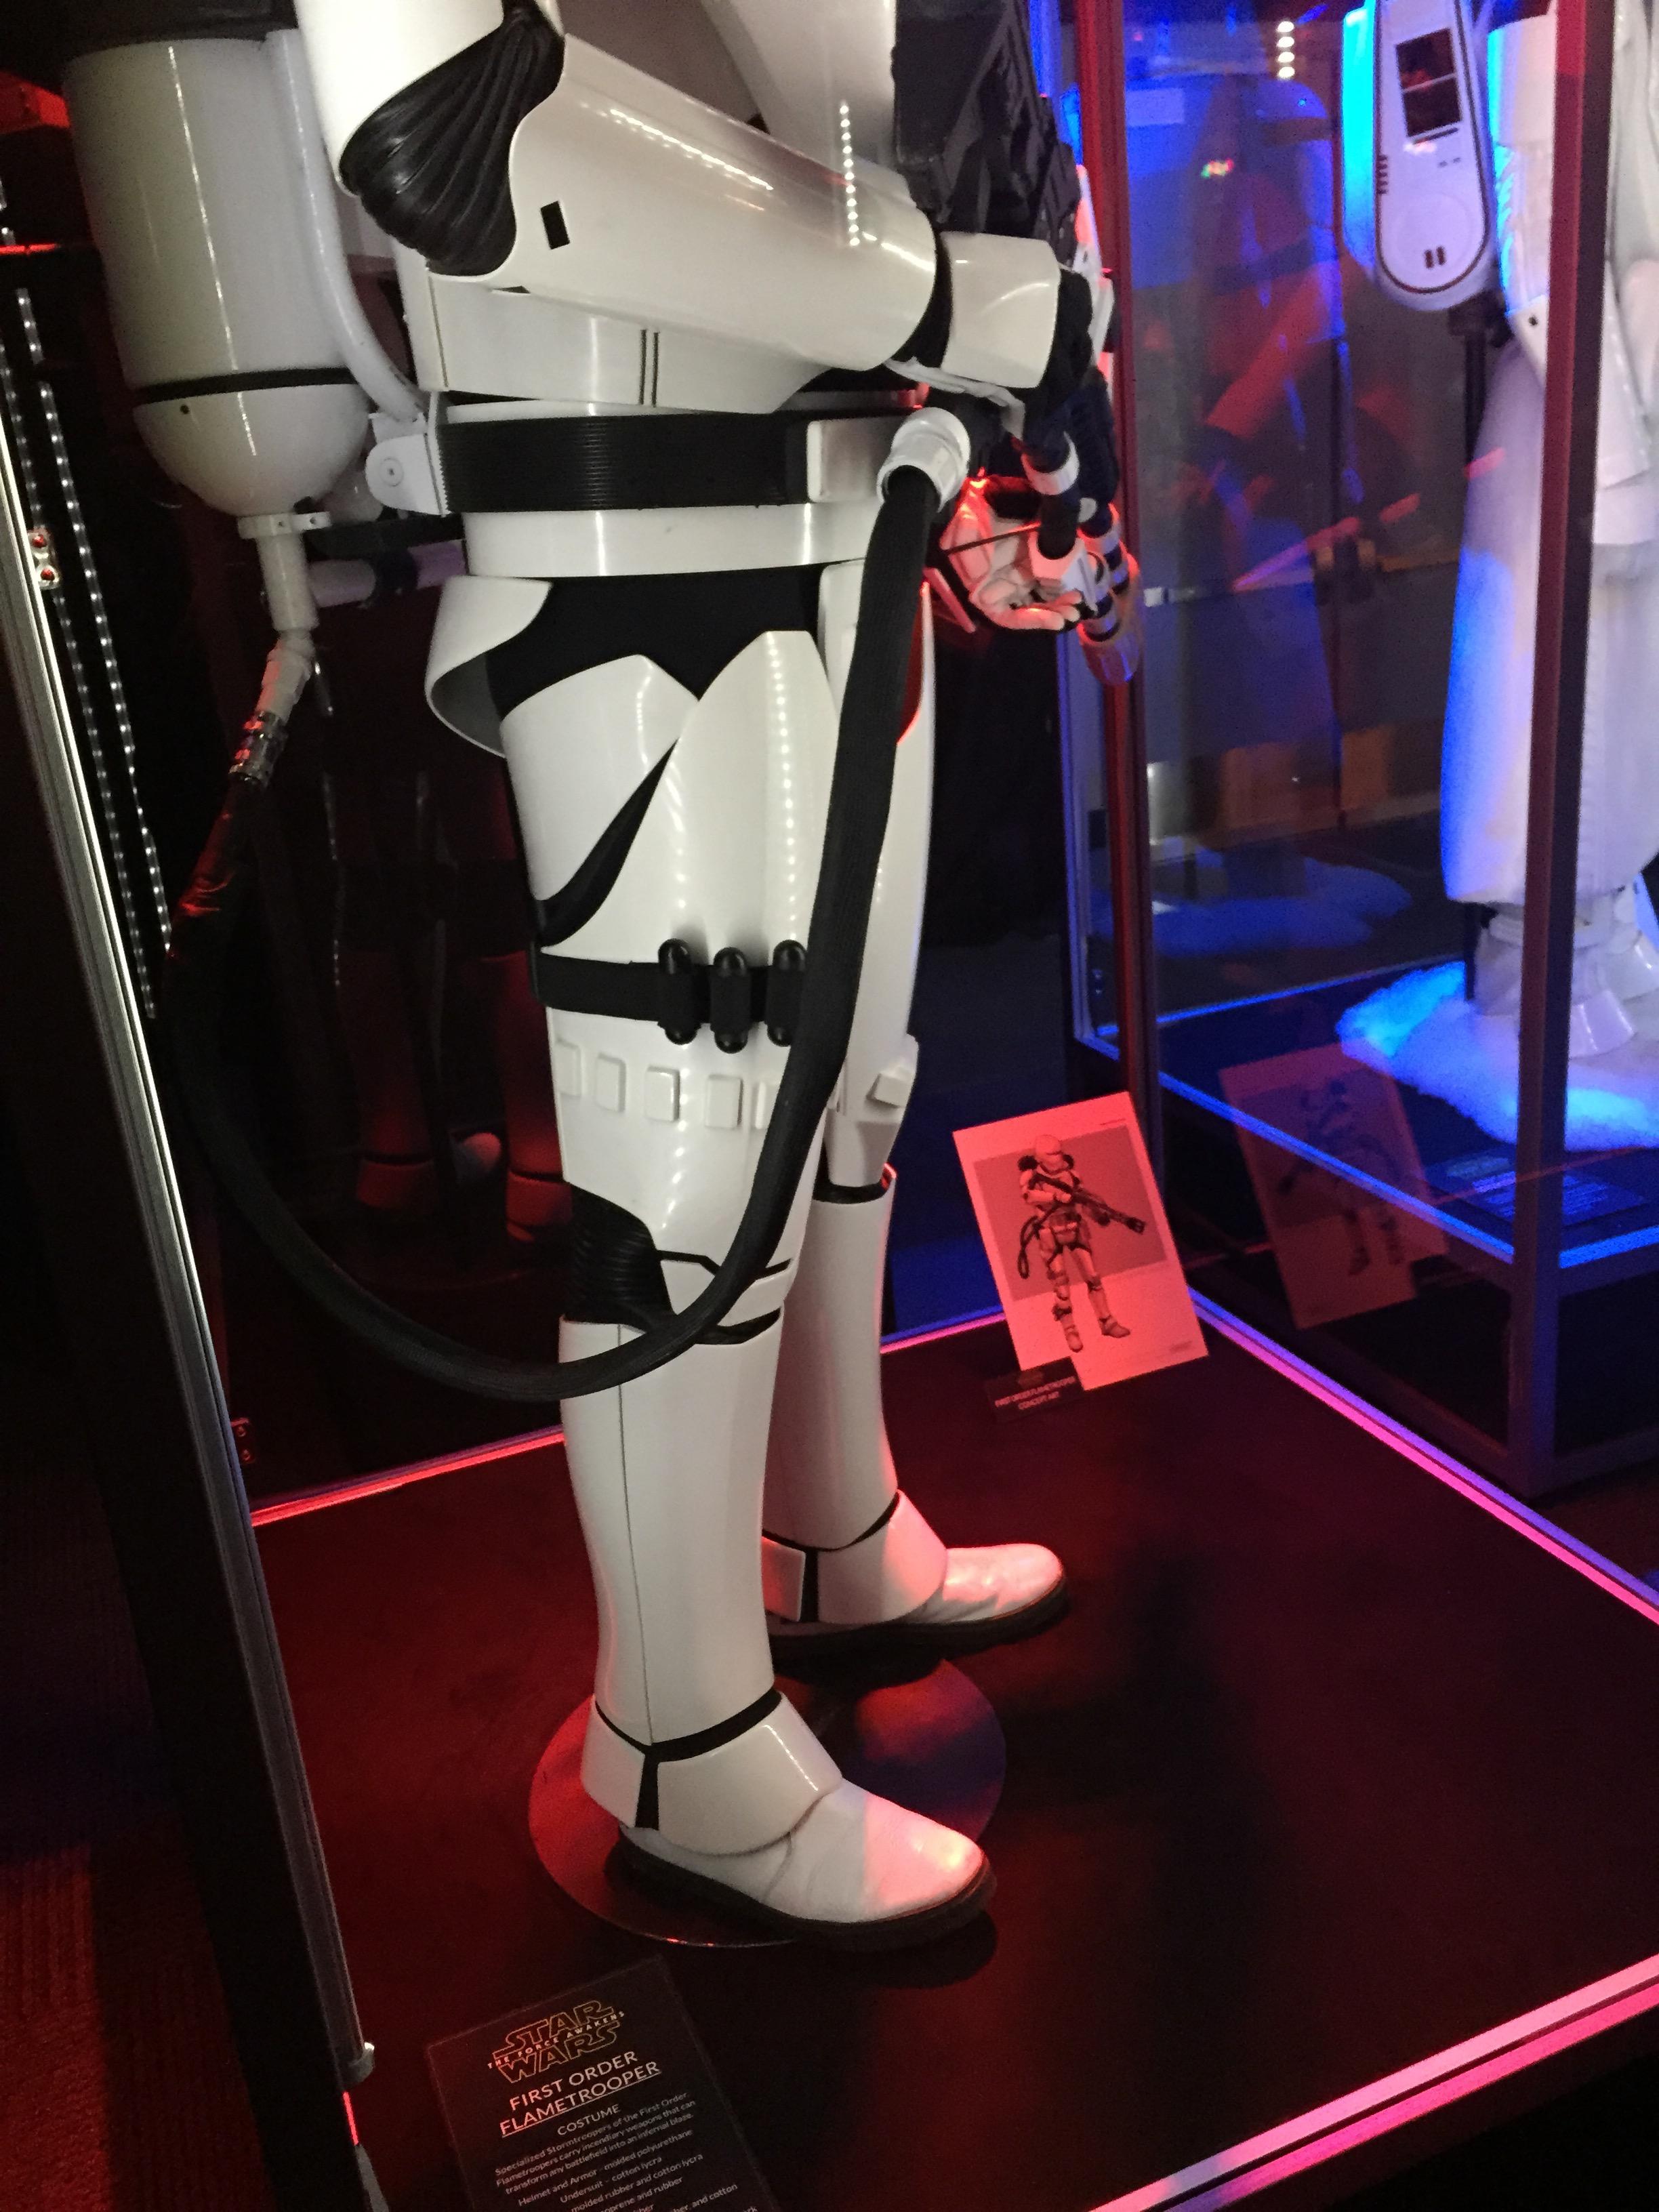 Force Awakens Exhibit  - 65.jpg